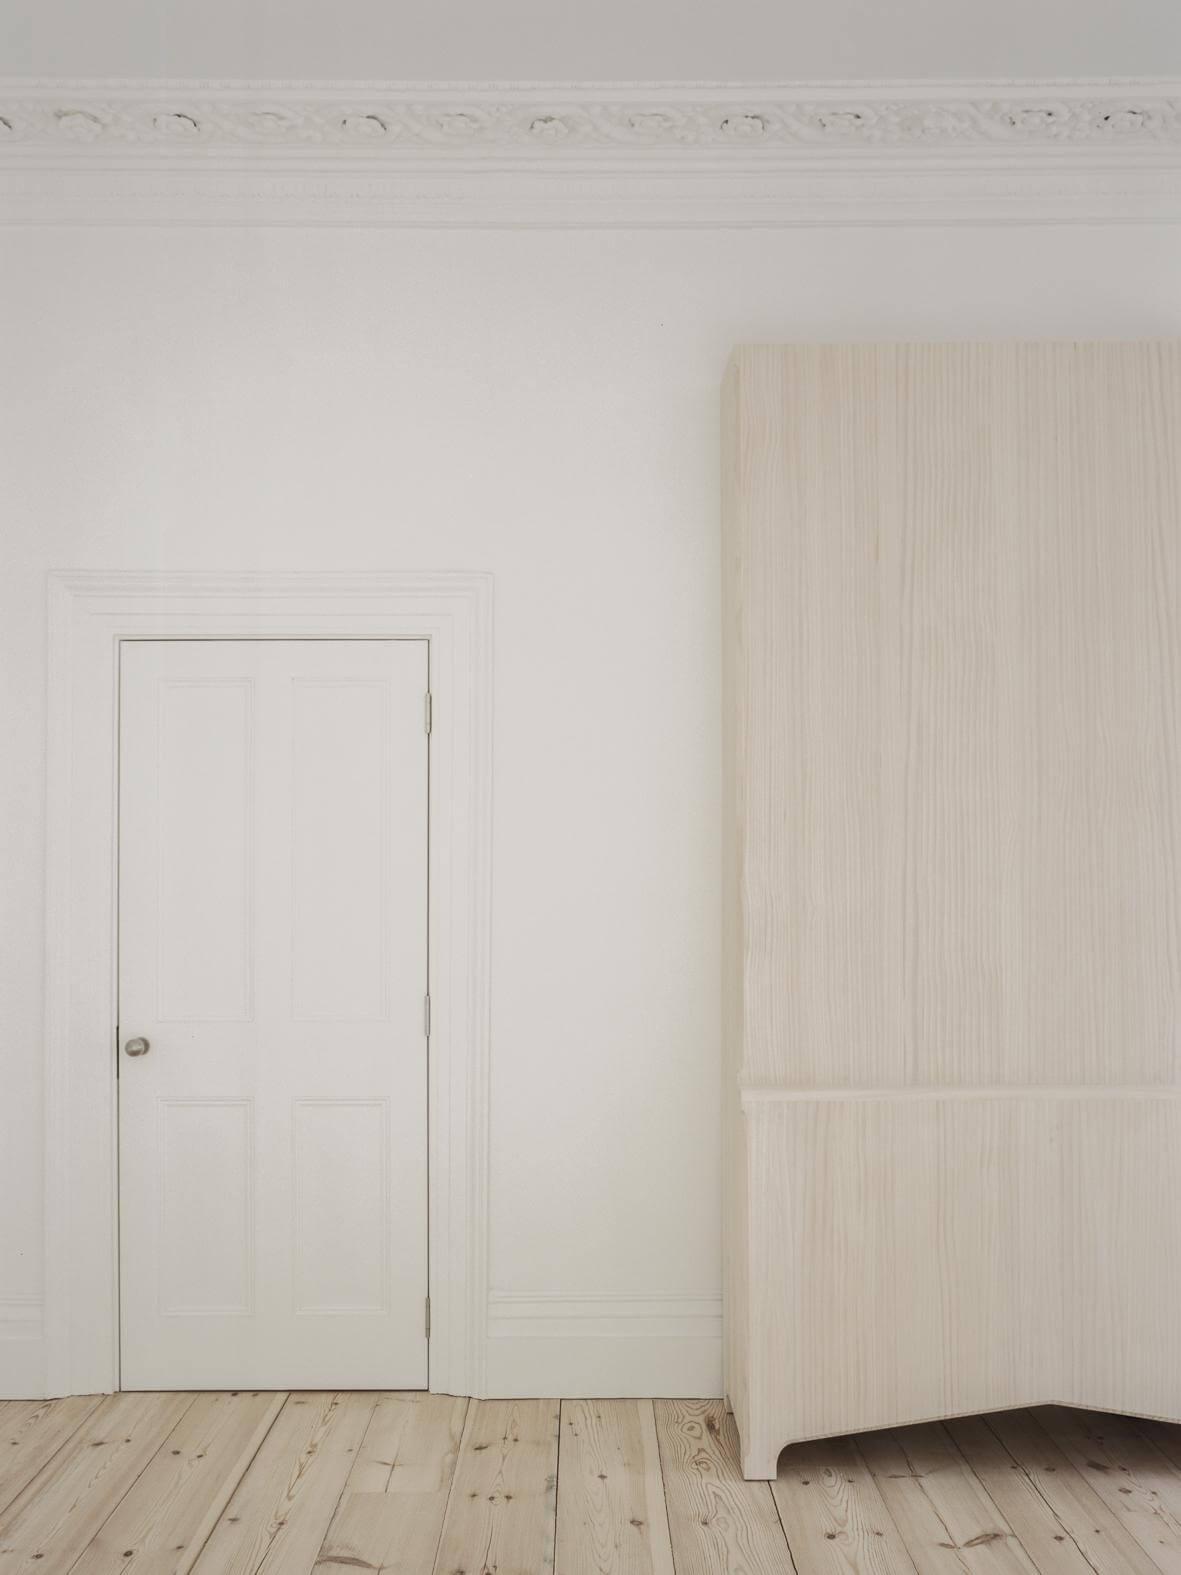 lorenzo zandri the old rectory door and jones neville cabinet